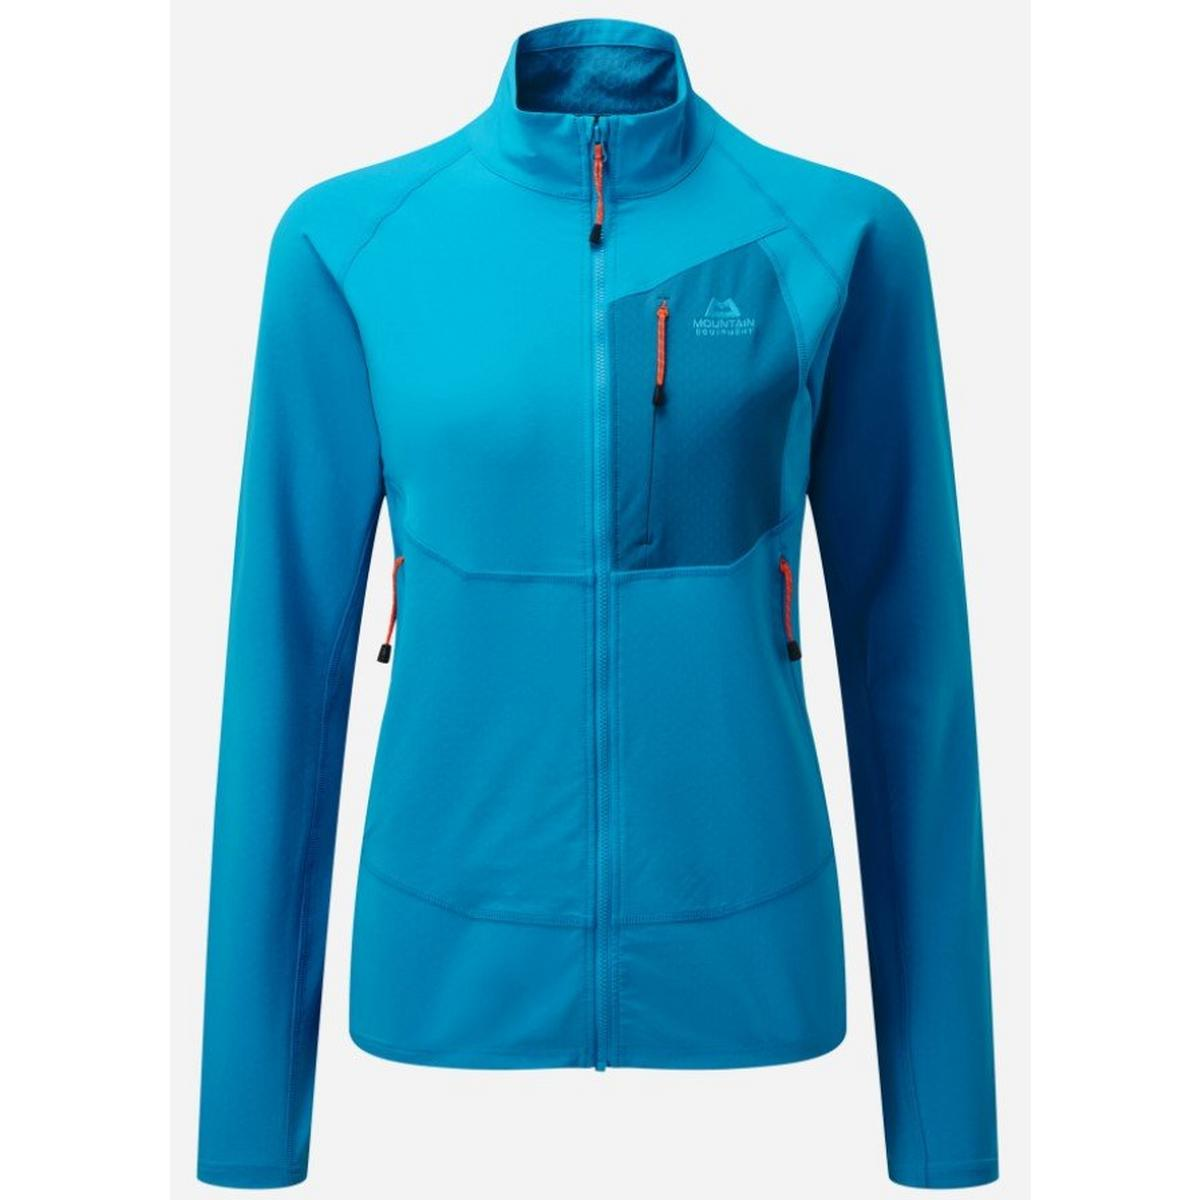 Mountain Equipment Women's Arrow Jacket - Blue